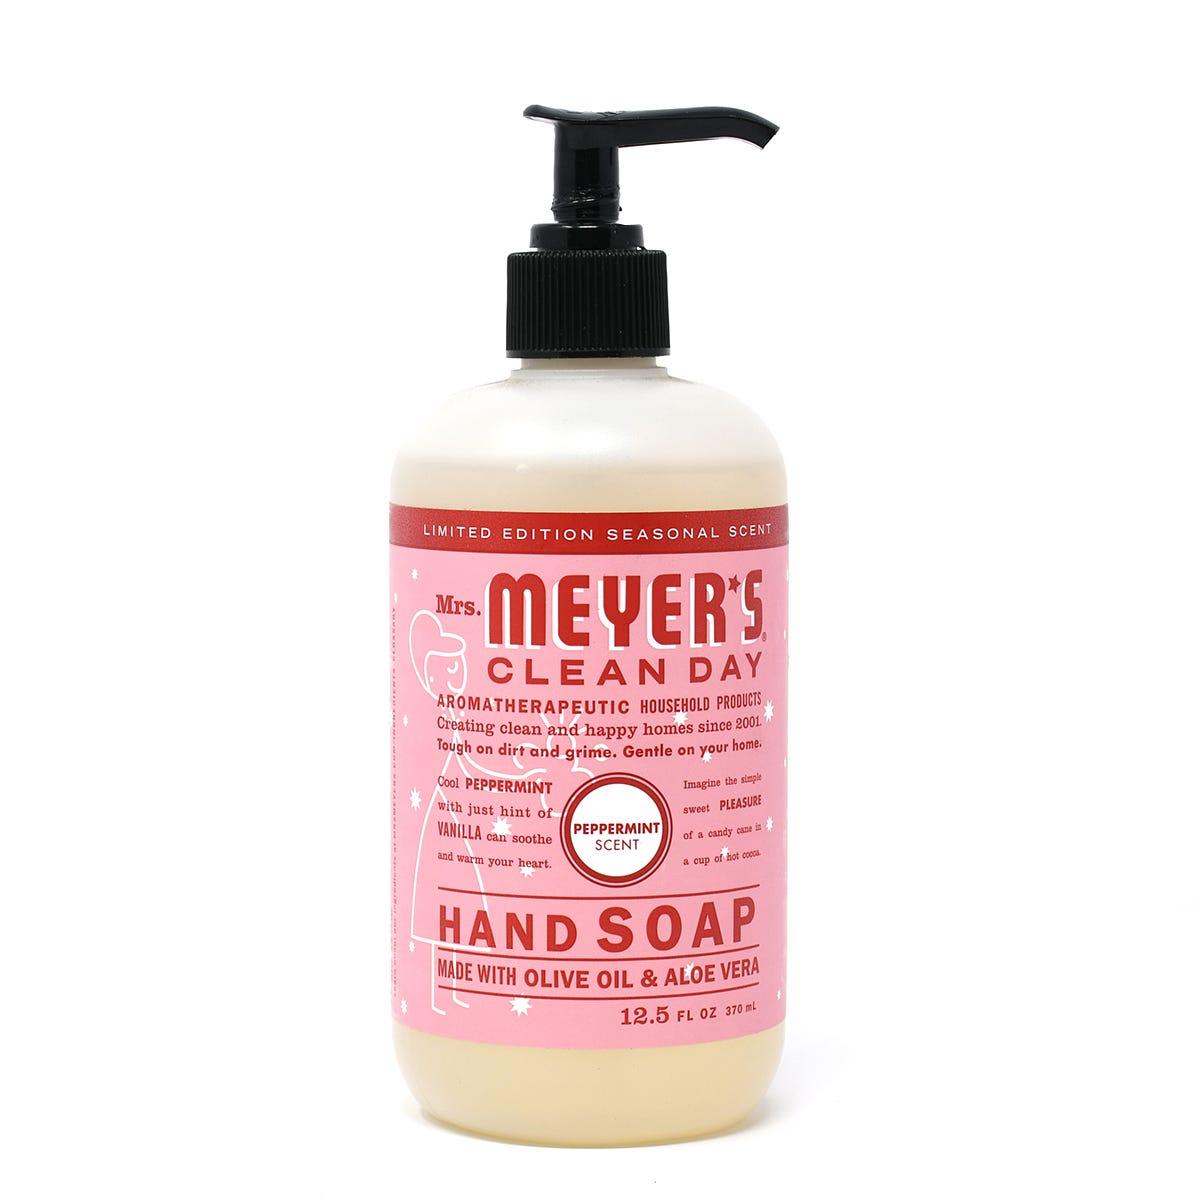 Jabón líquido para manos Mrs. Meyers de 369.66 mL aroma a menta